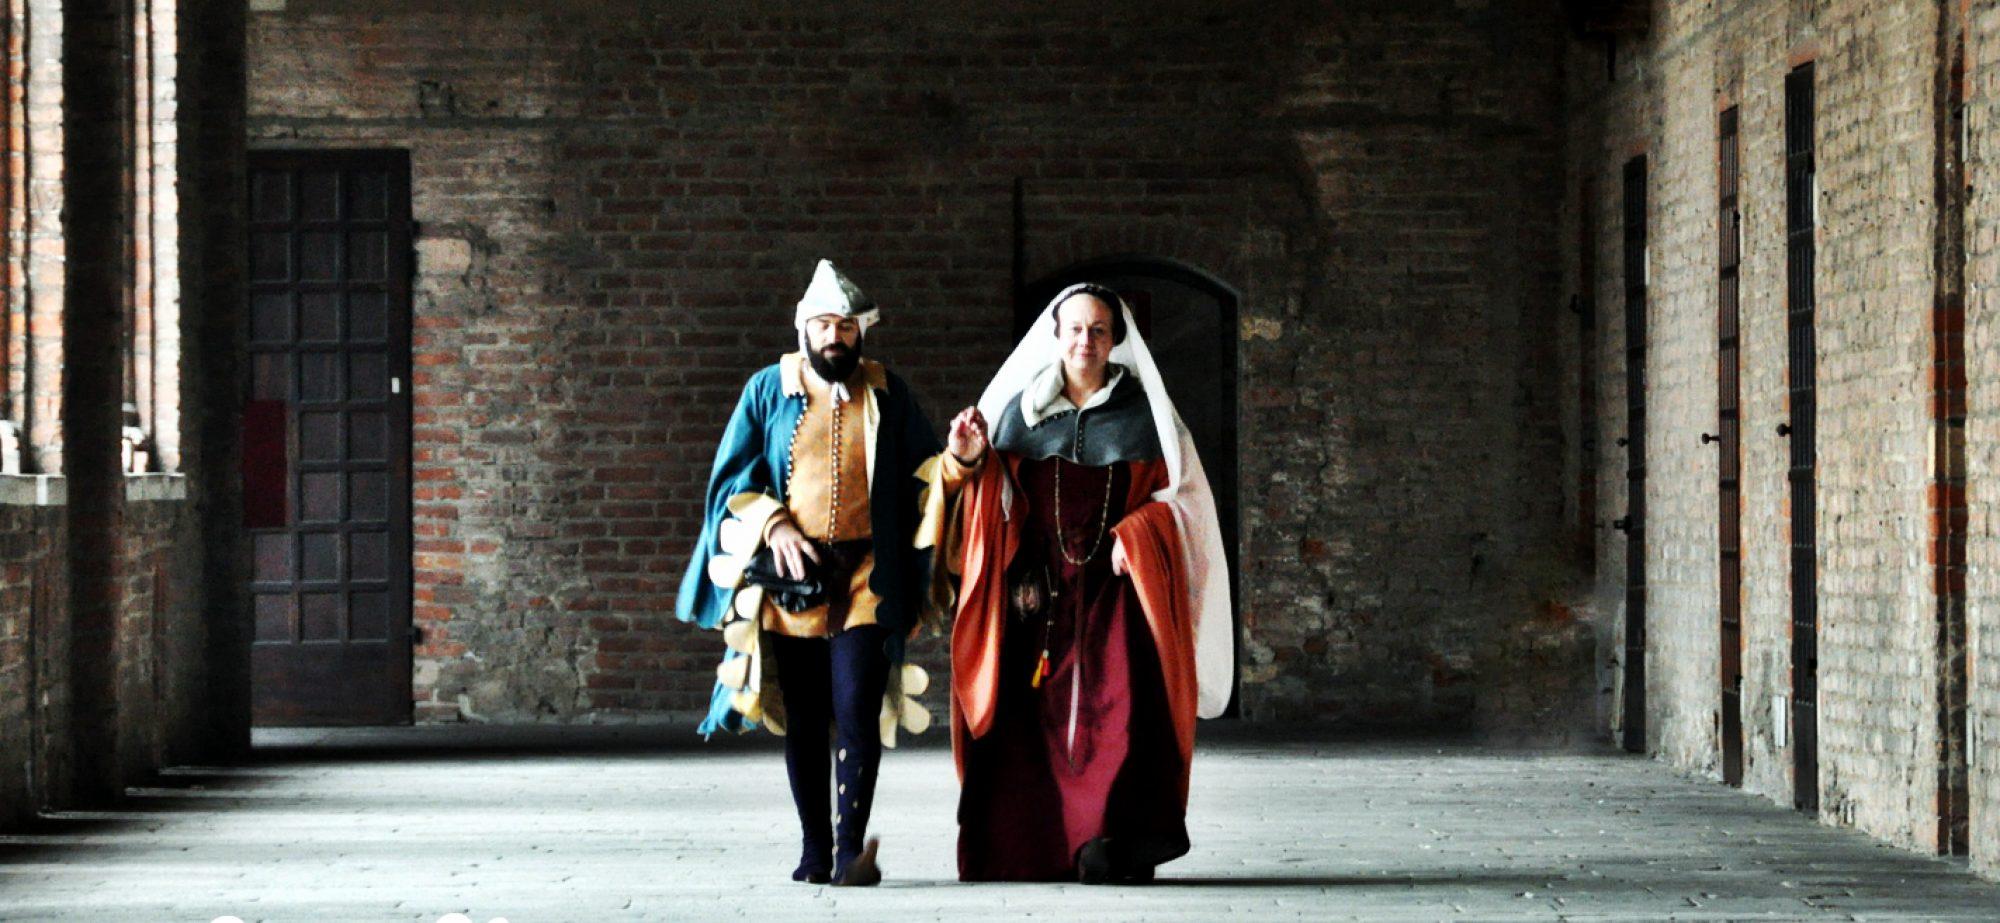 Scherma Storica Pavia